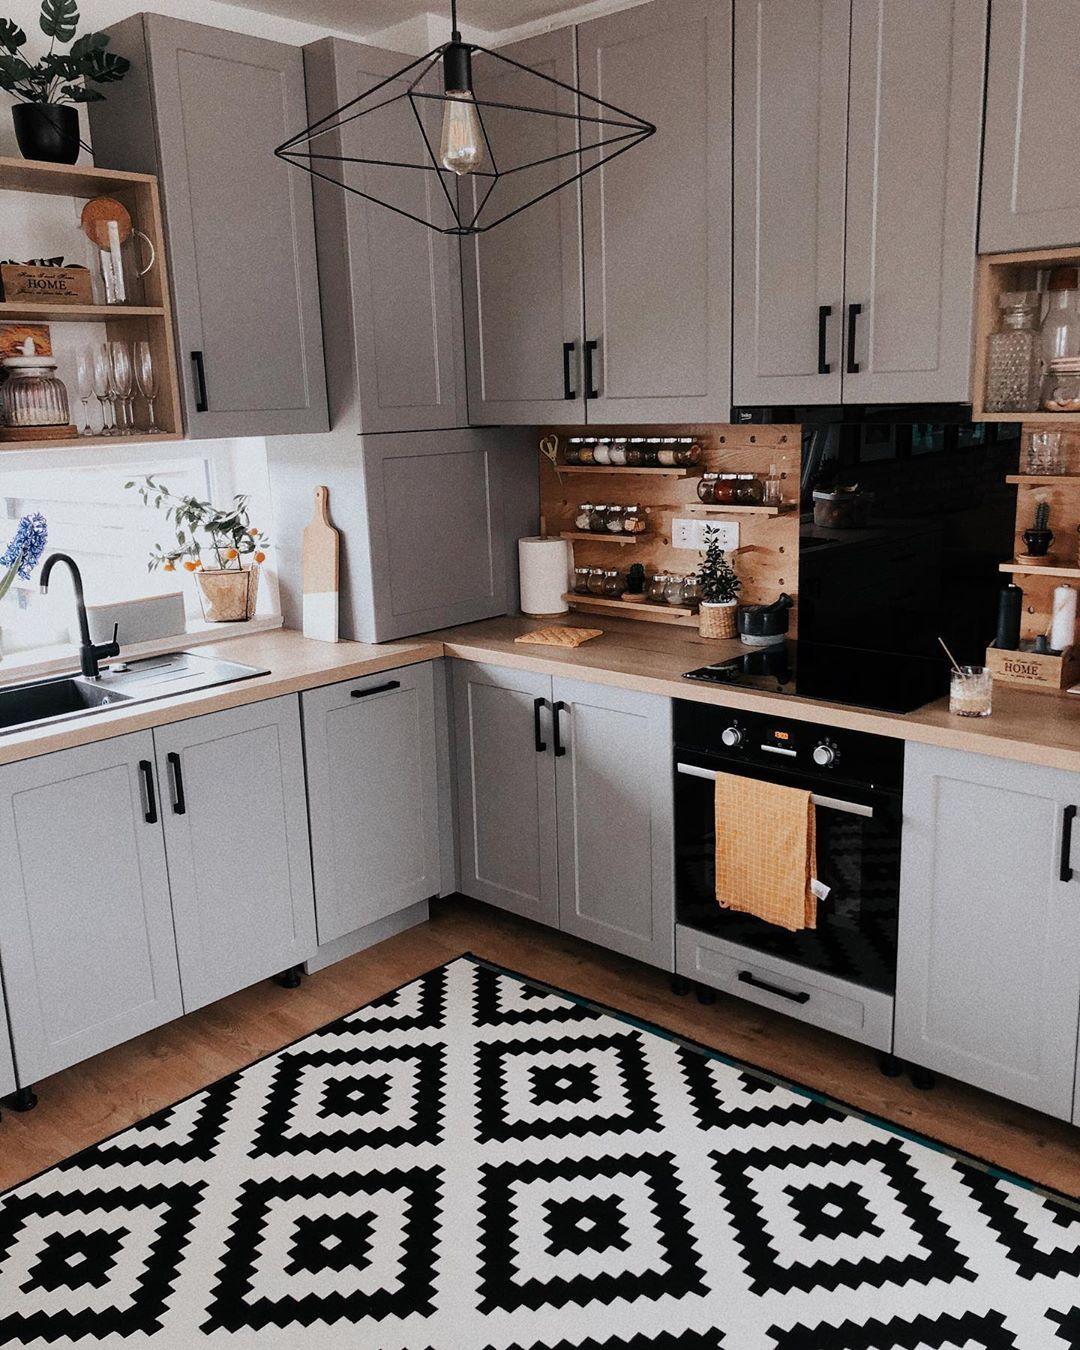 𝖱𝖺𝗂𝗇𝗒 𝗌𝖺𝗍𝗎𝗋𝖽𝖺𝗒𝗌 ☕️ in 9   Home decor, Kitchen ...